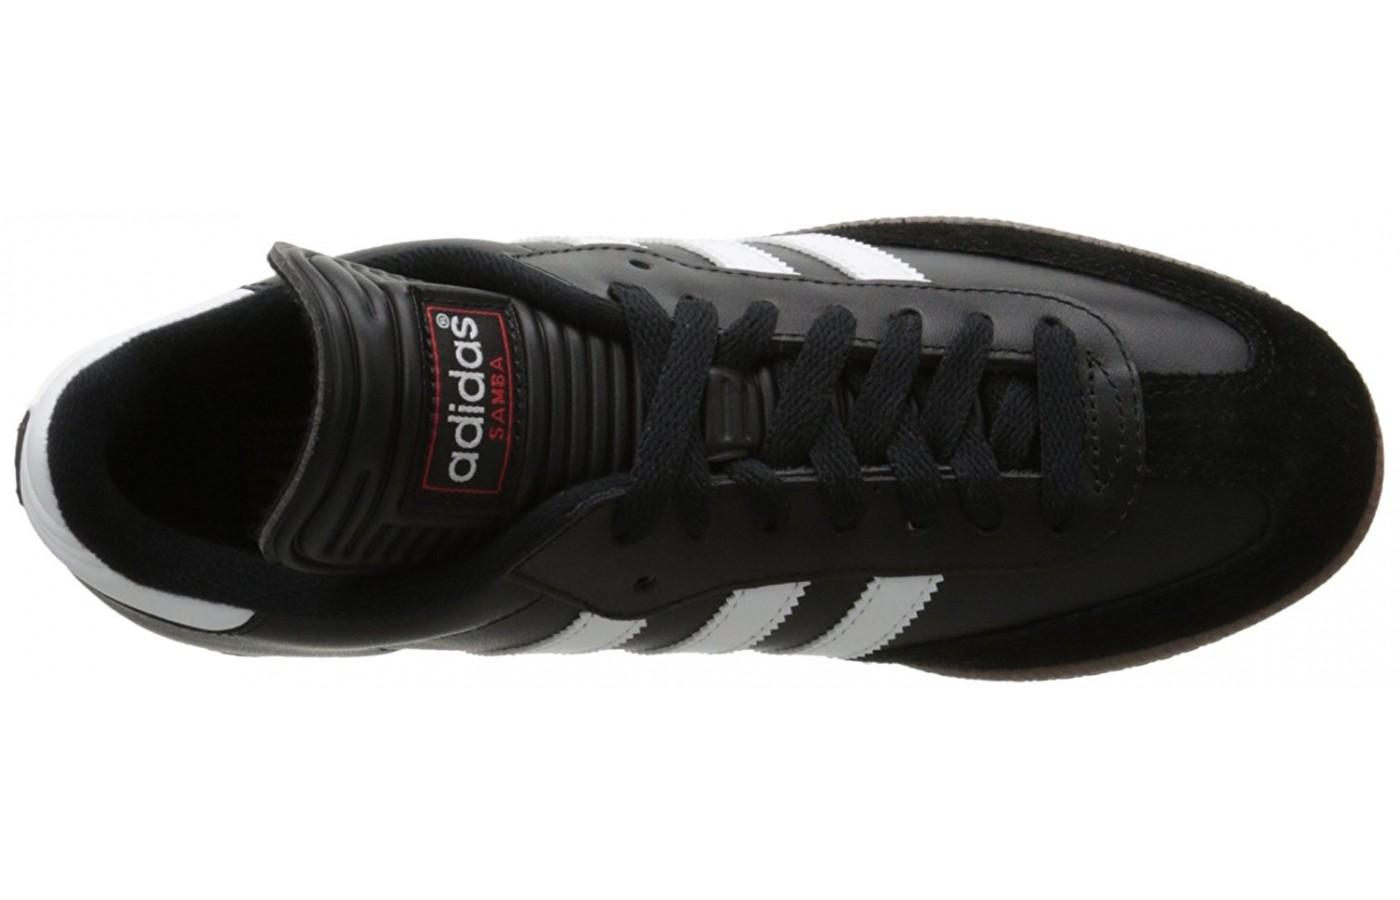 Adidas Samba Upper